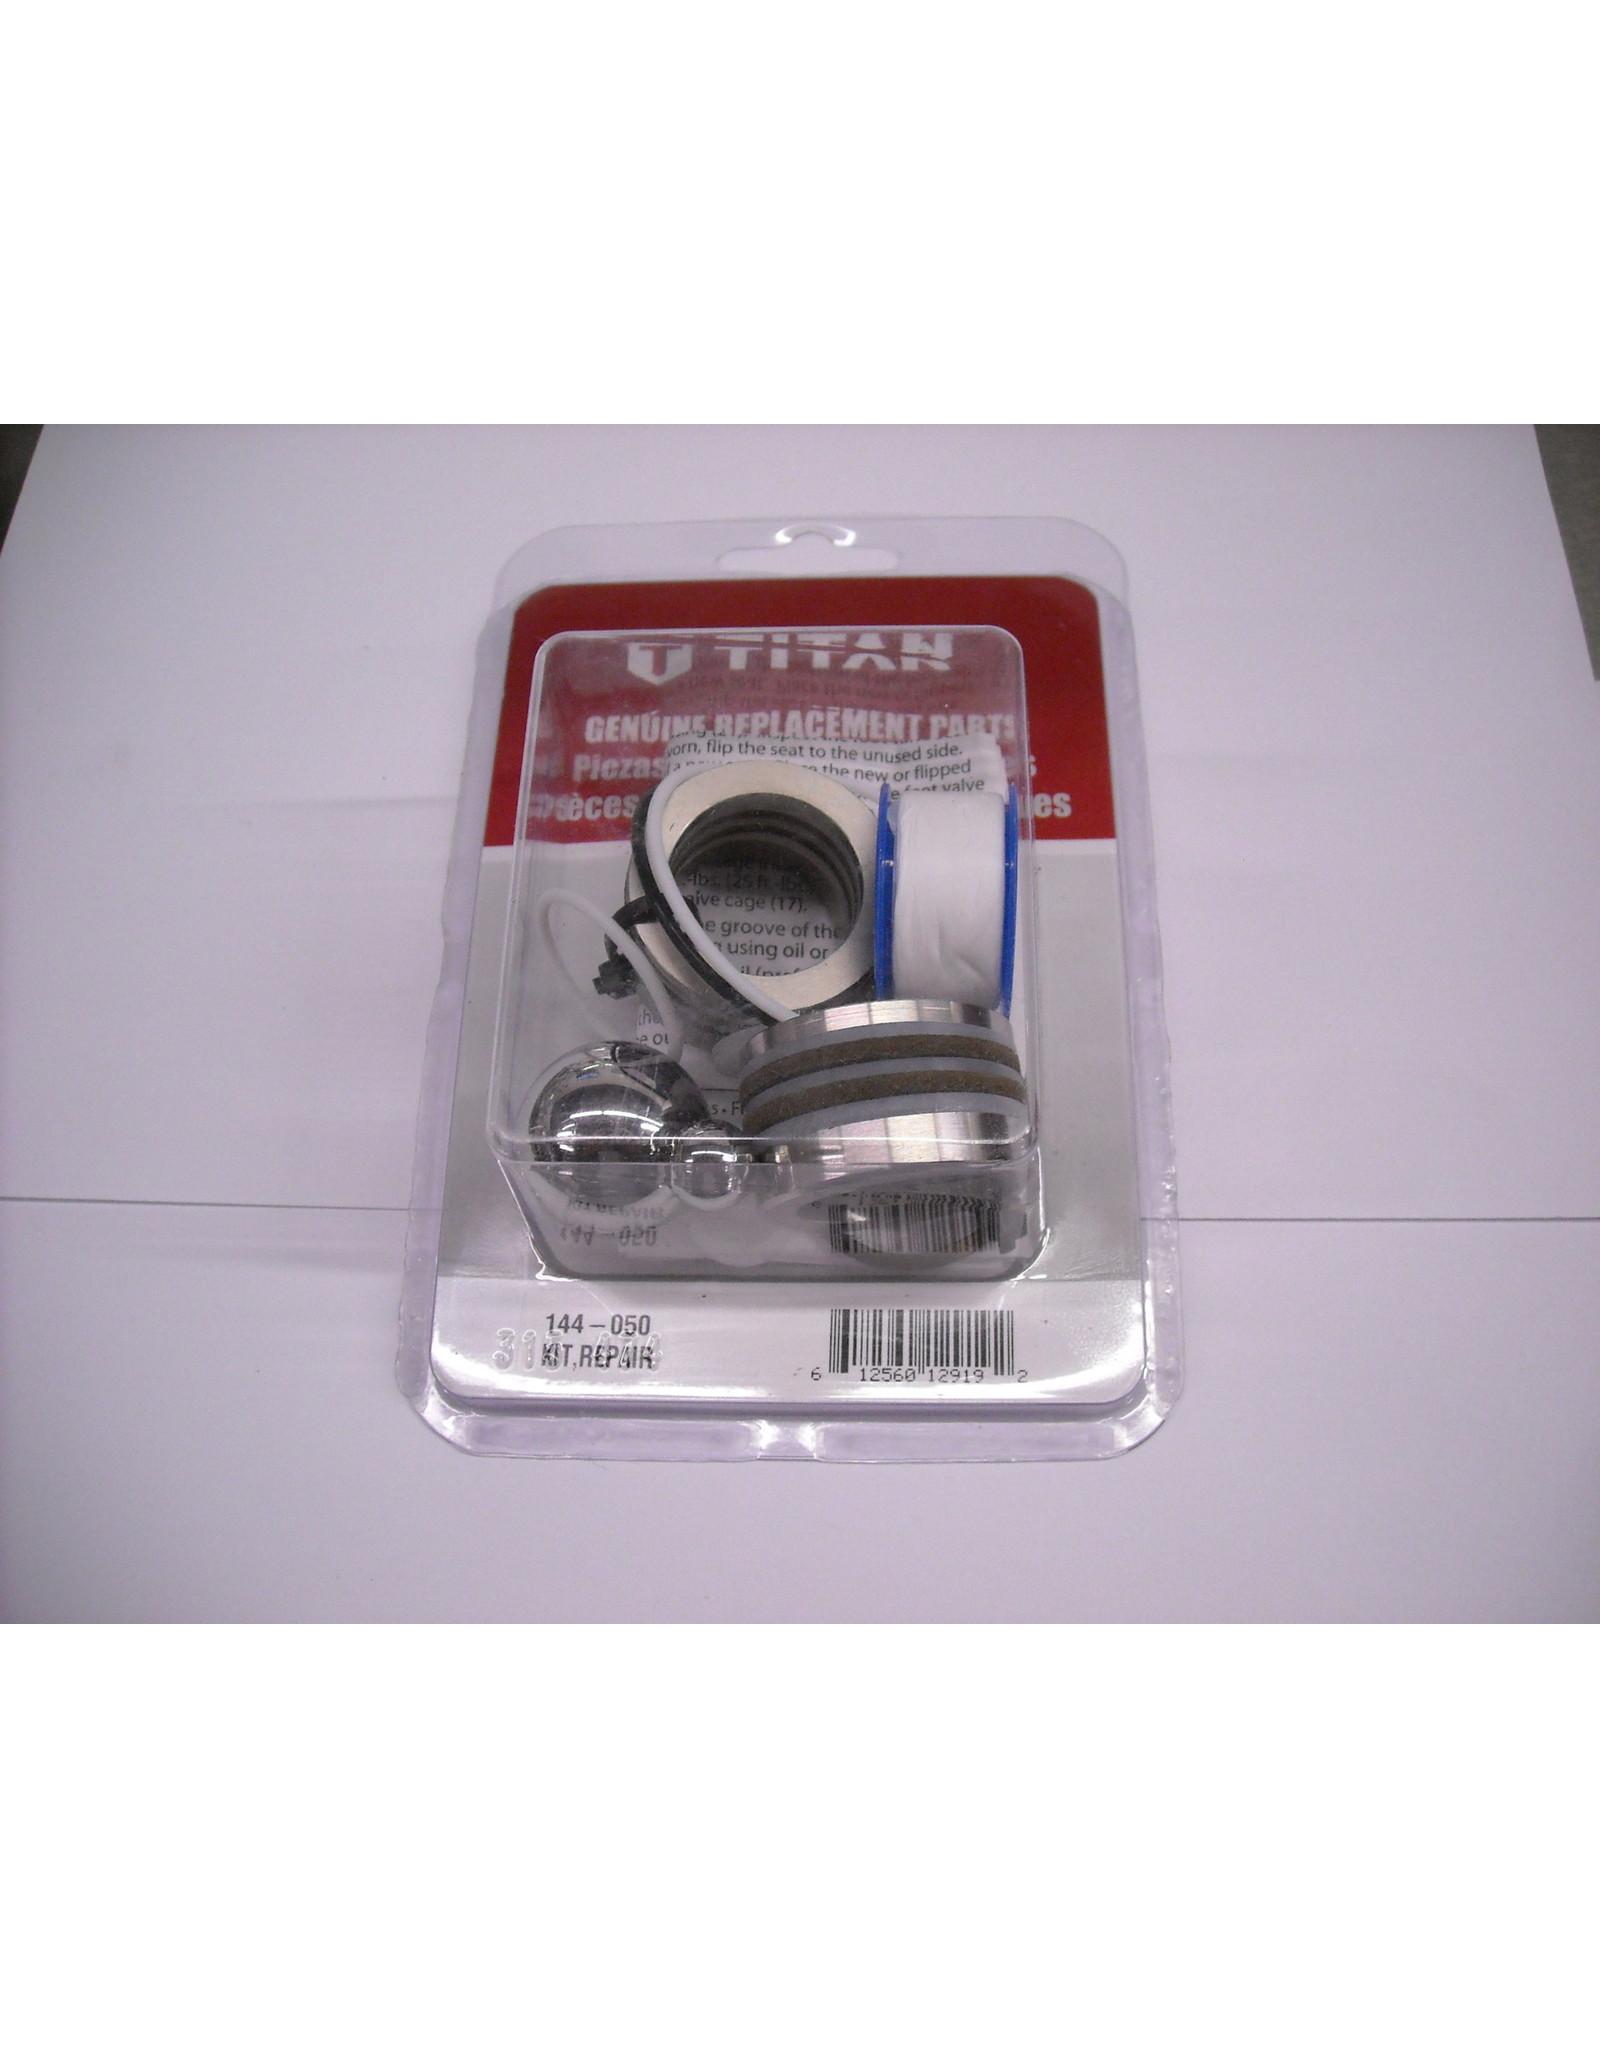 Titan 144-050 PT 5500 Thru 12000